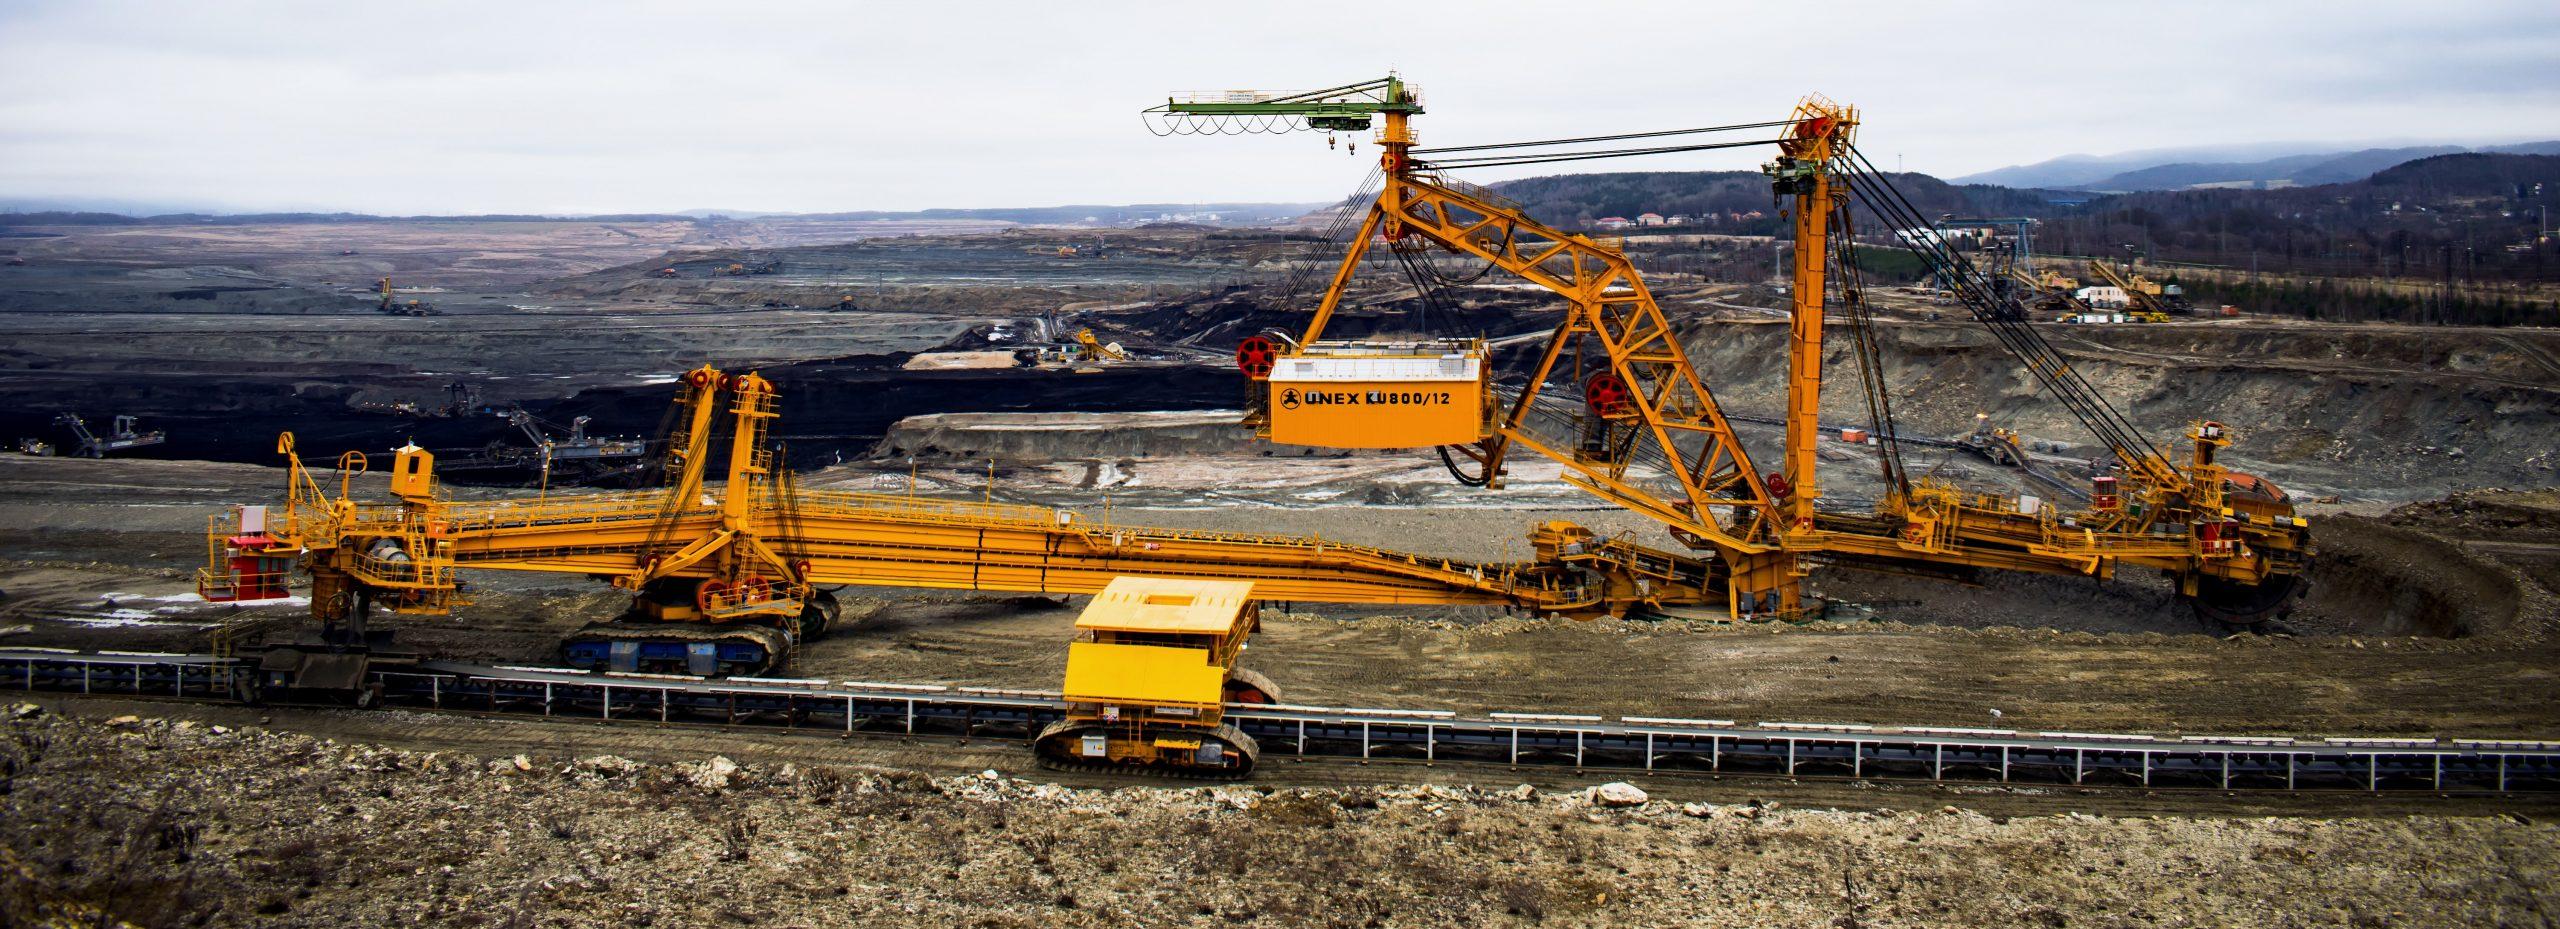 Cranes lifting heavy stuff